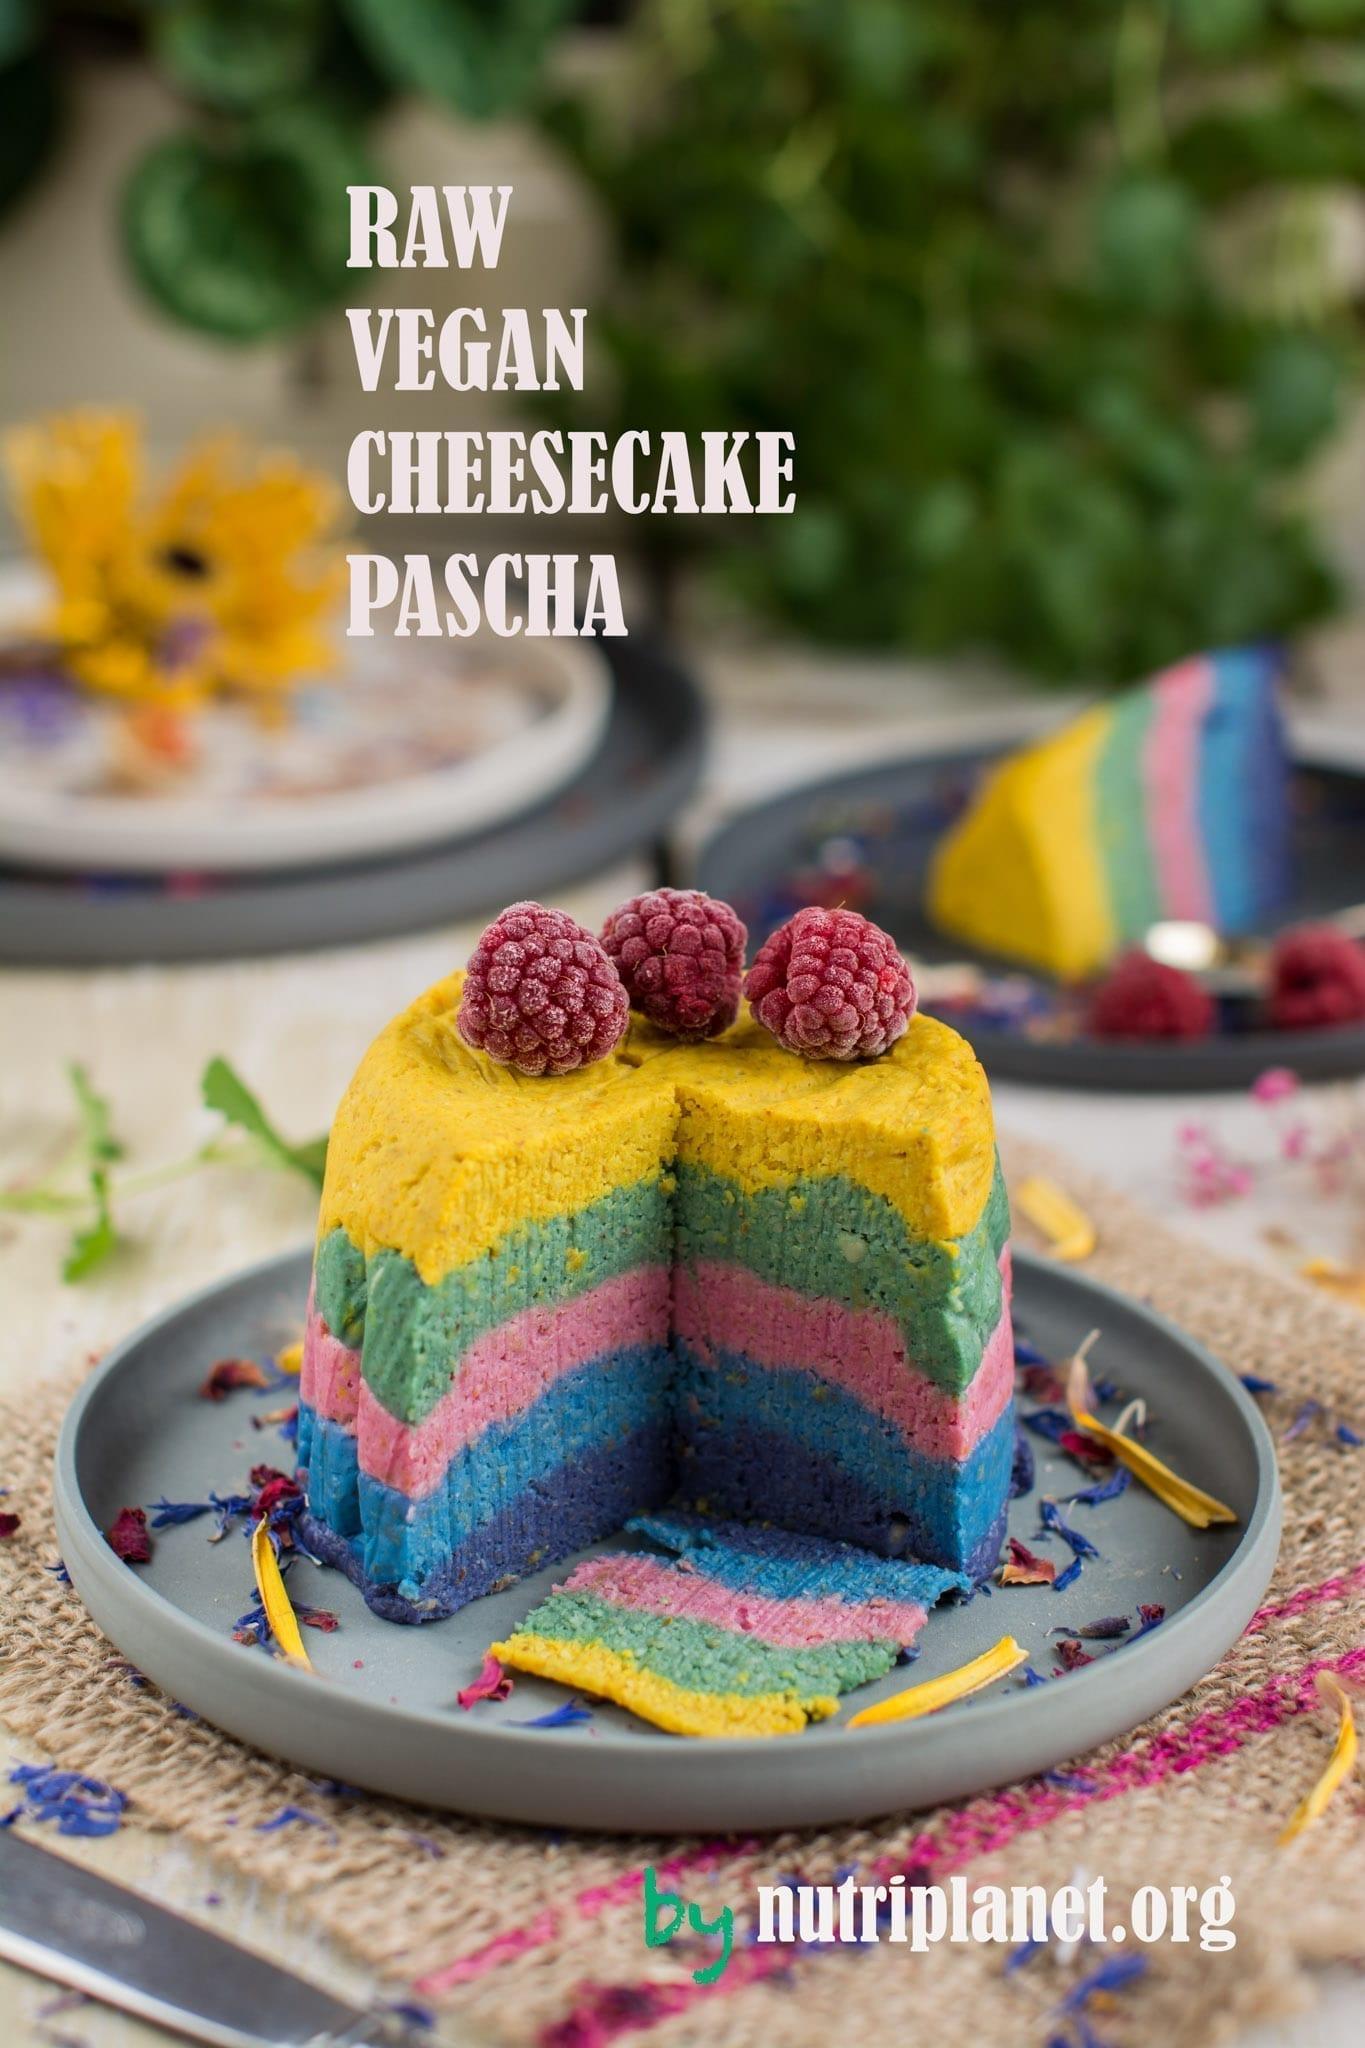 Raw Vegan Cheesecake [Gluten Free, Oil Free, Refined Sugar Free]